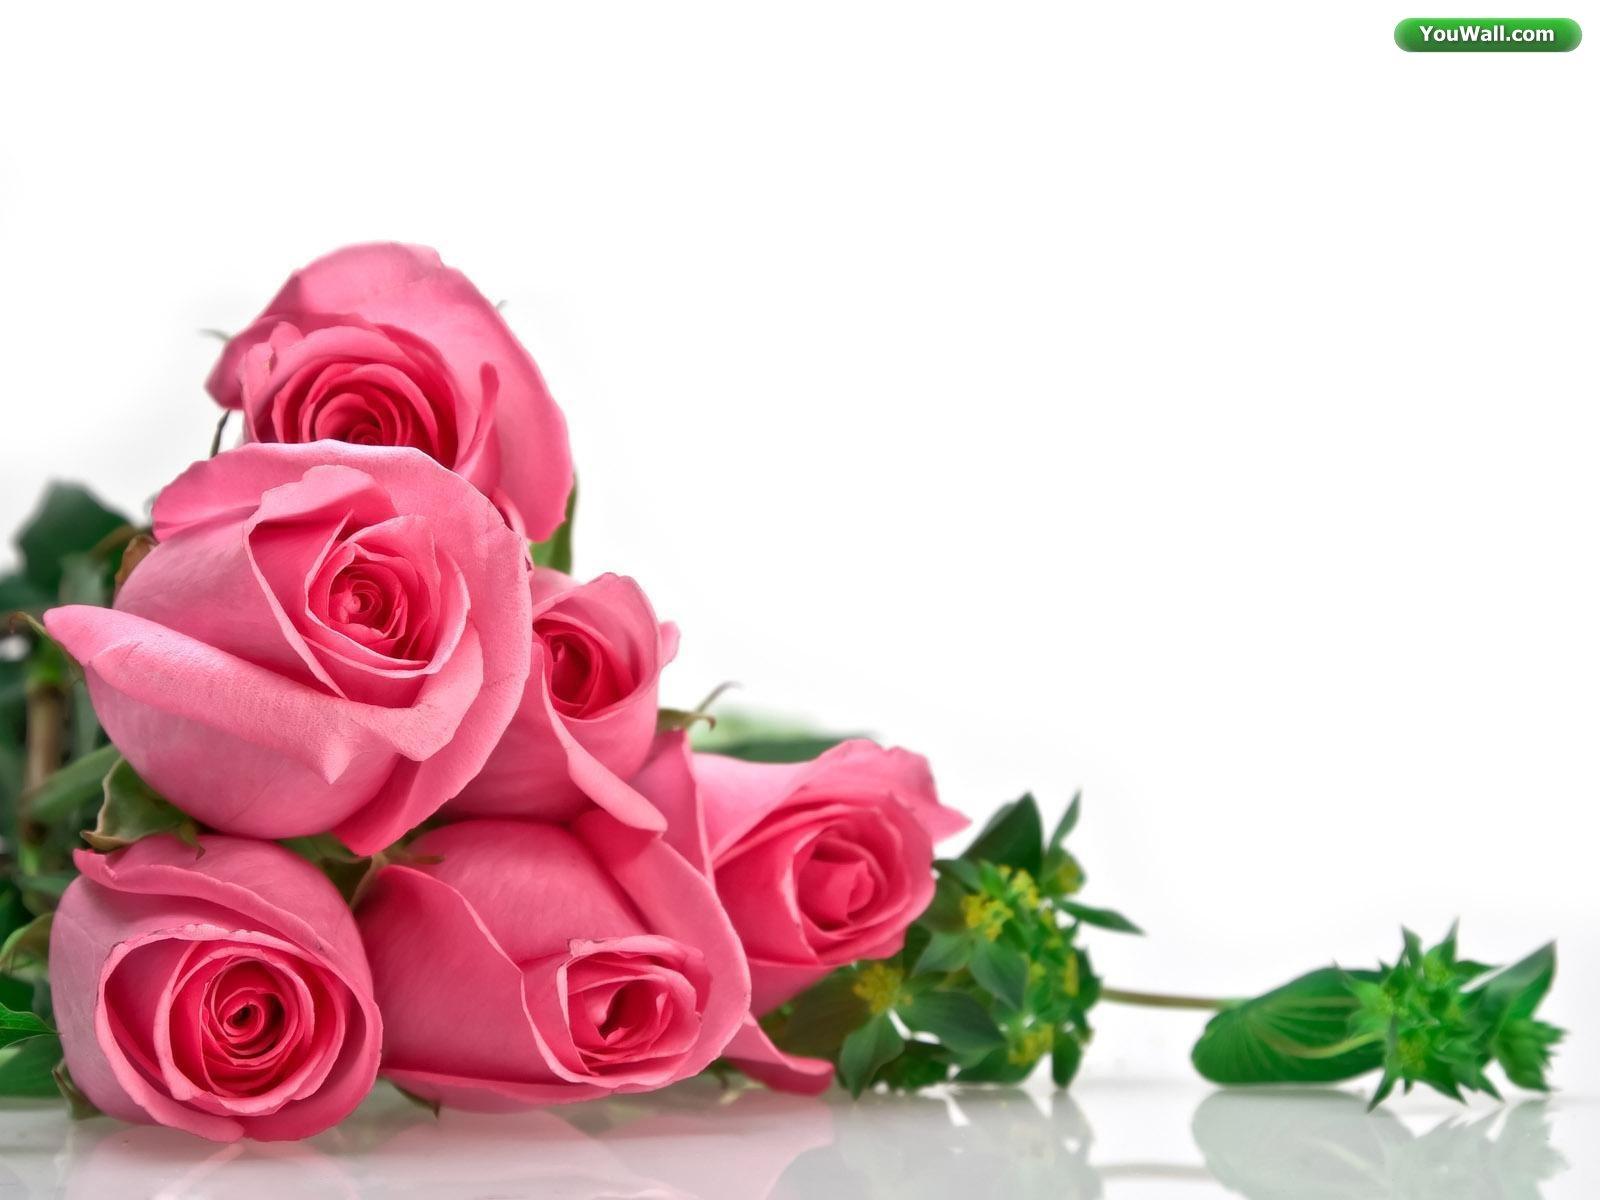 Happy Birthday To Me Flowers 1600x1200 Download Hd Wallpaper Wallpapertip